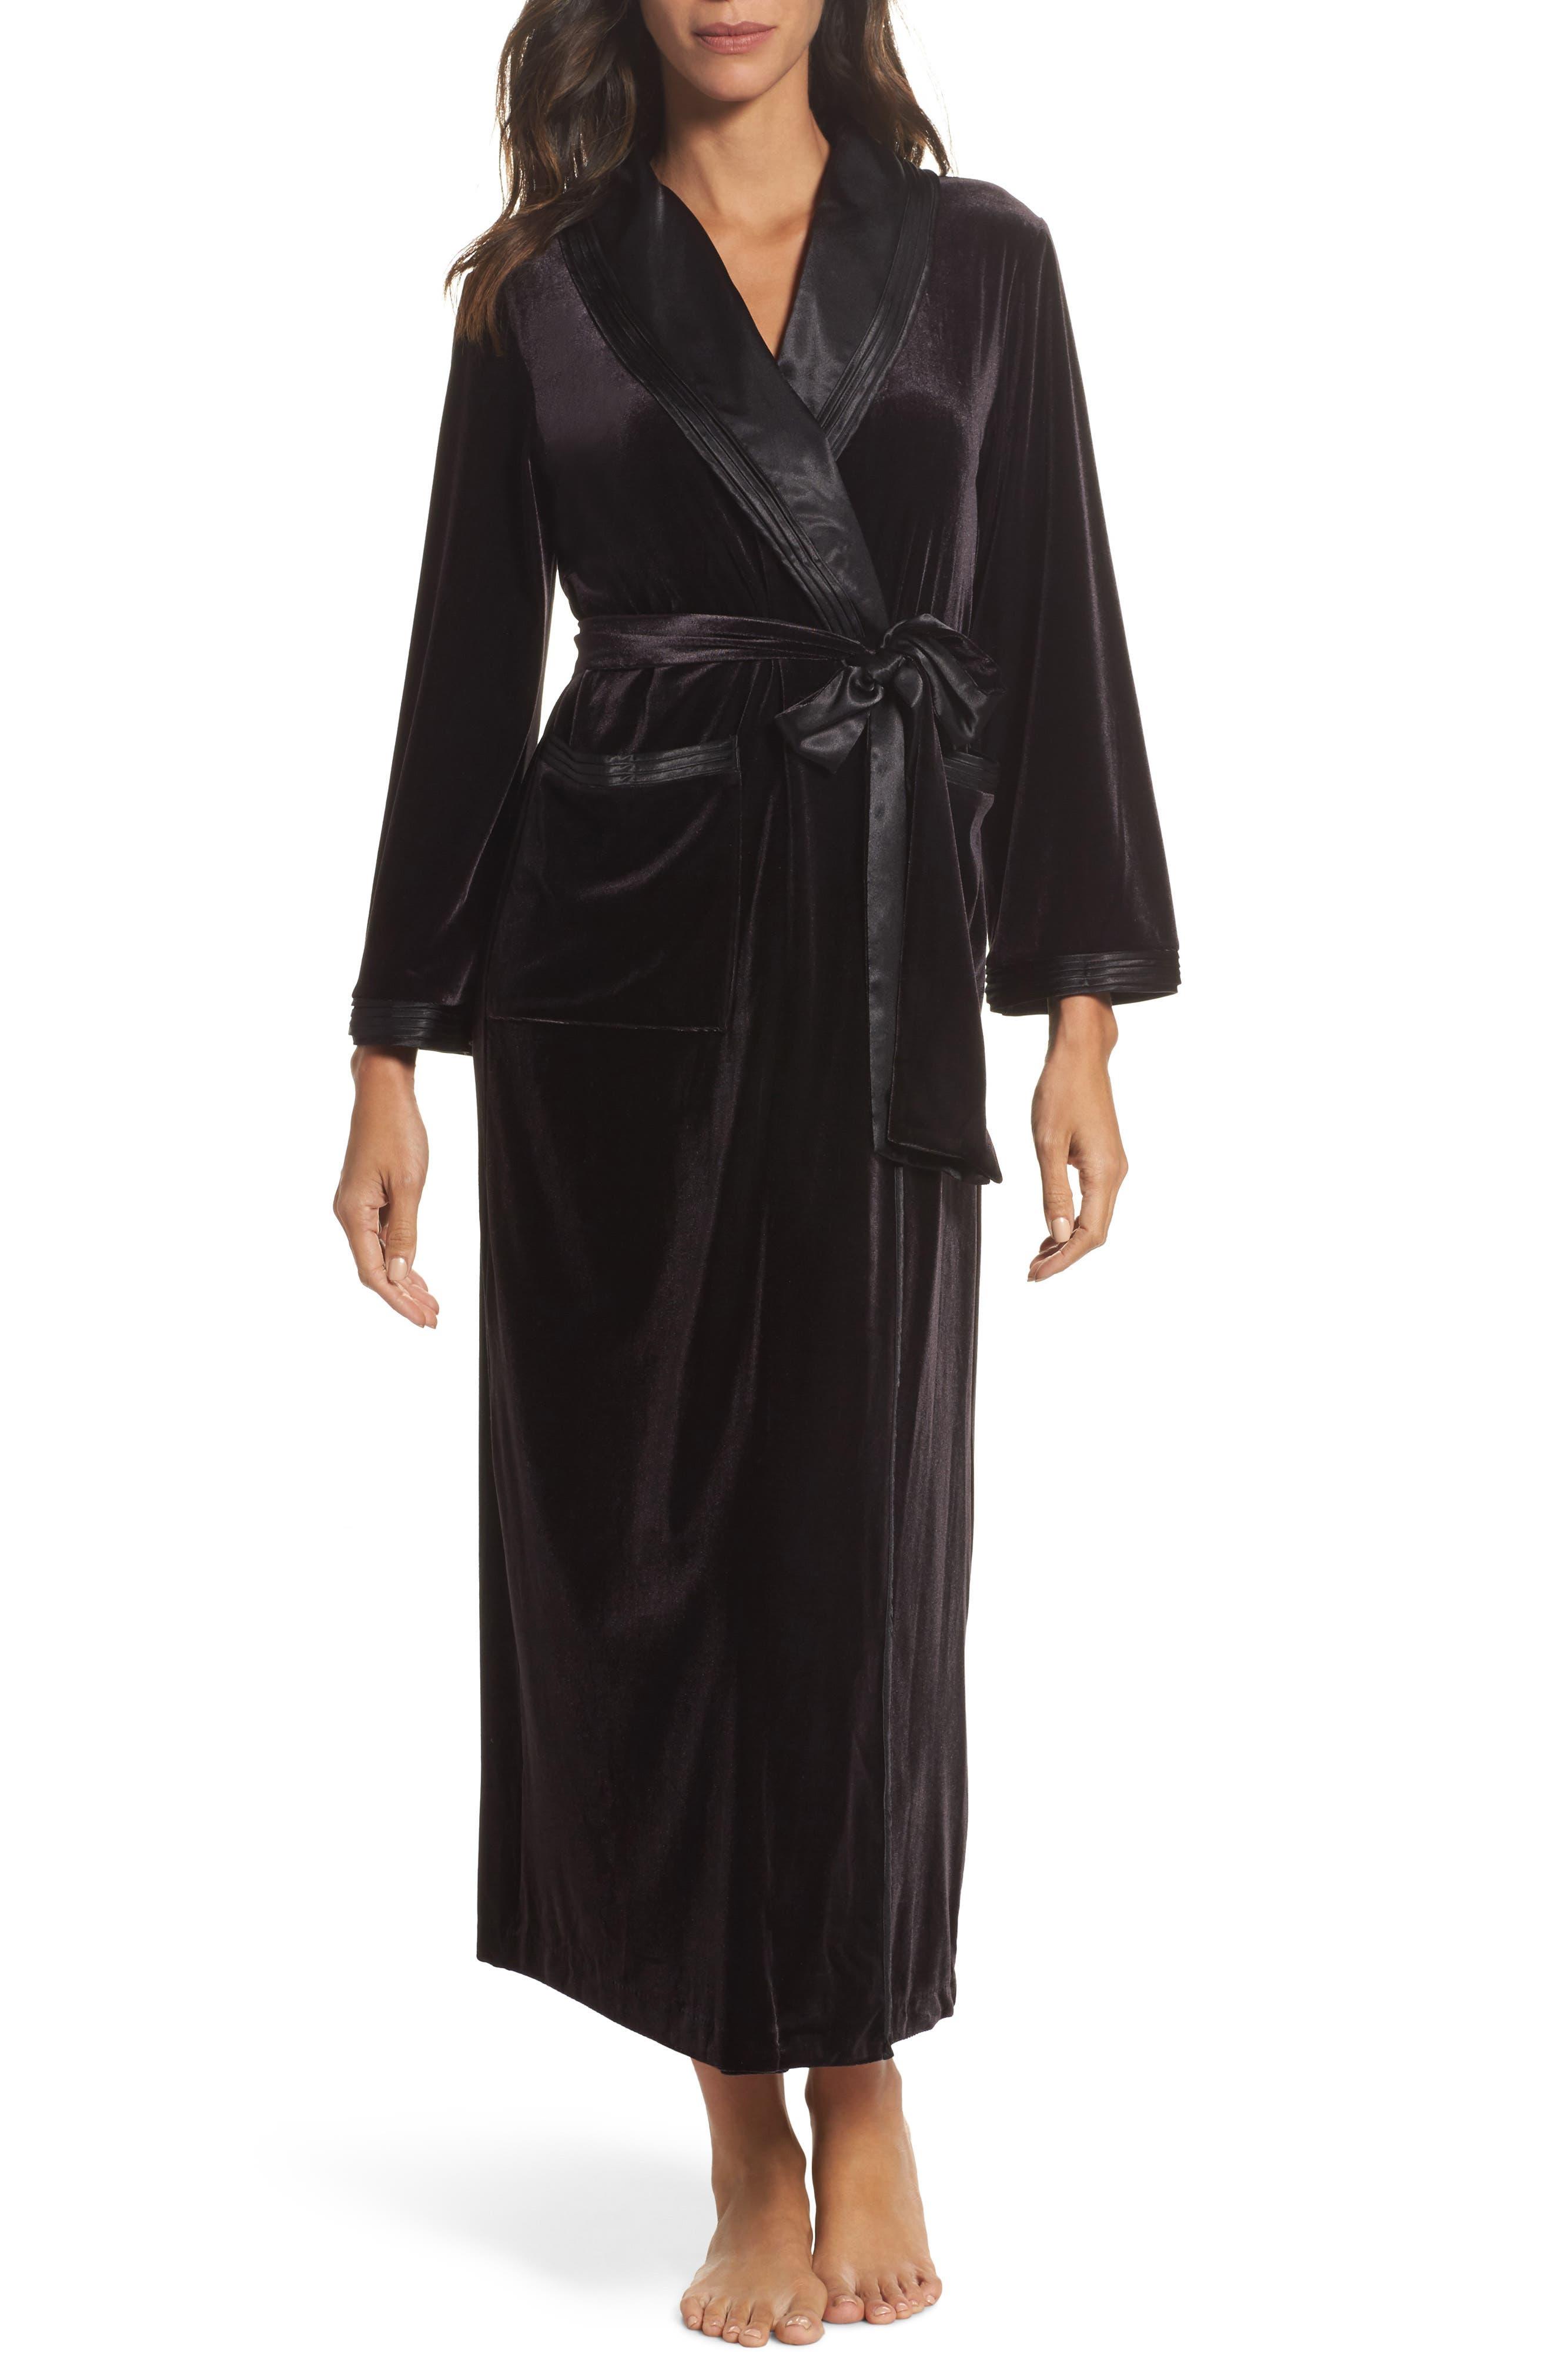 Oscar de la Renta Sleepwear Long Velvet Robe